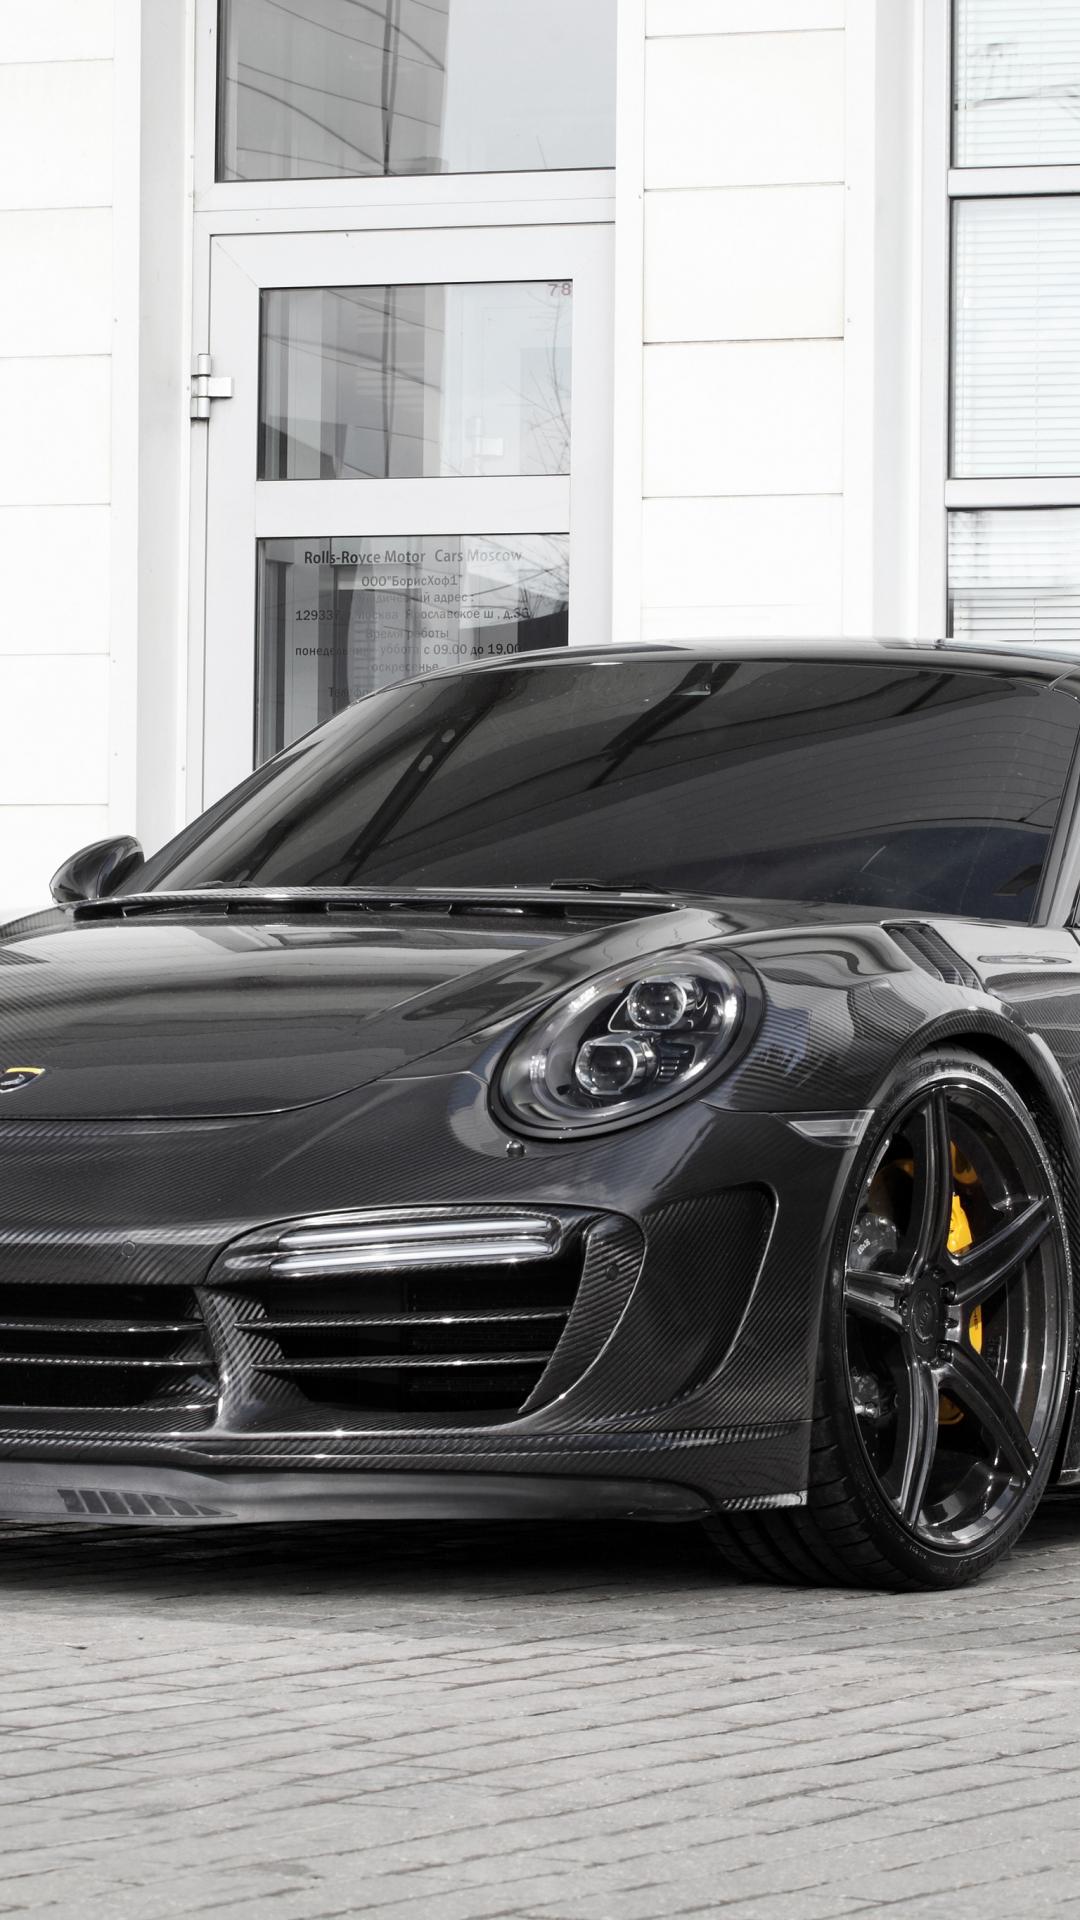 Download 1080x1920 Wallpaper Black Sports Car Porsche 911